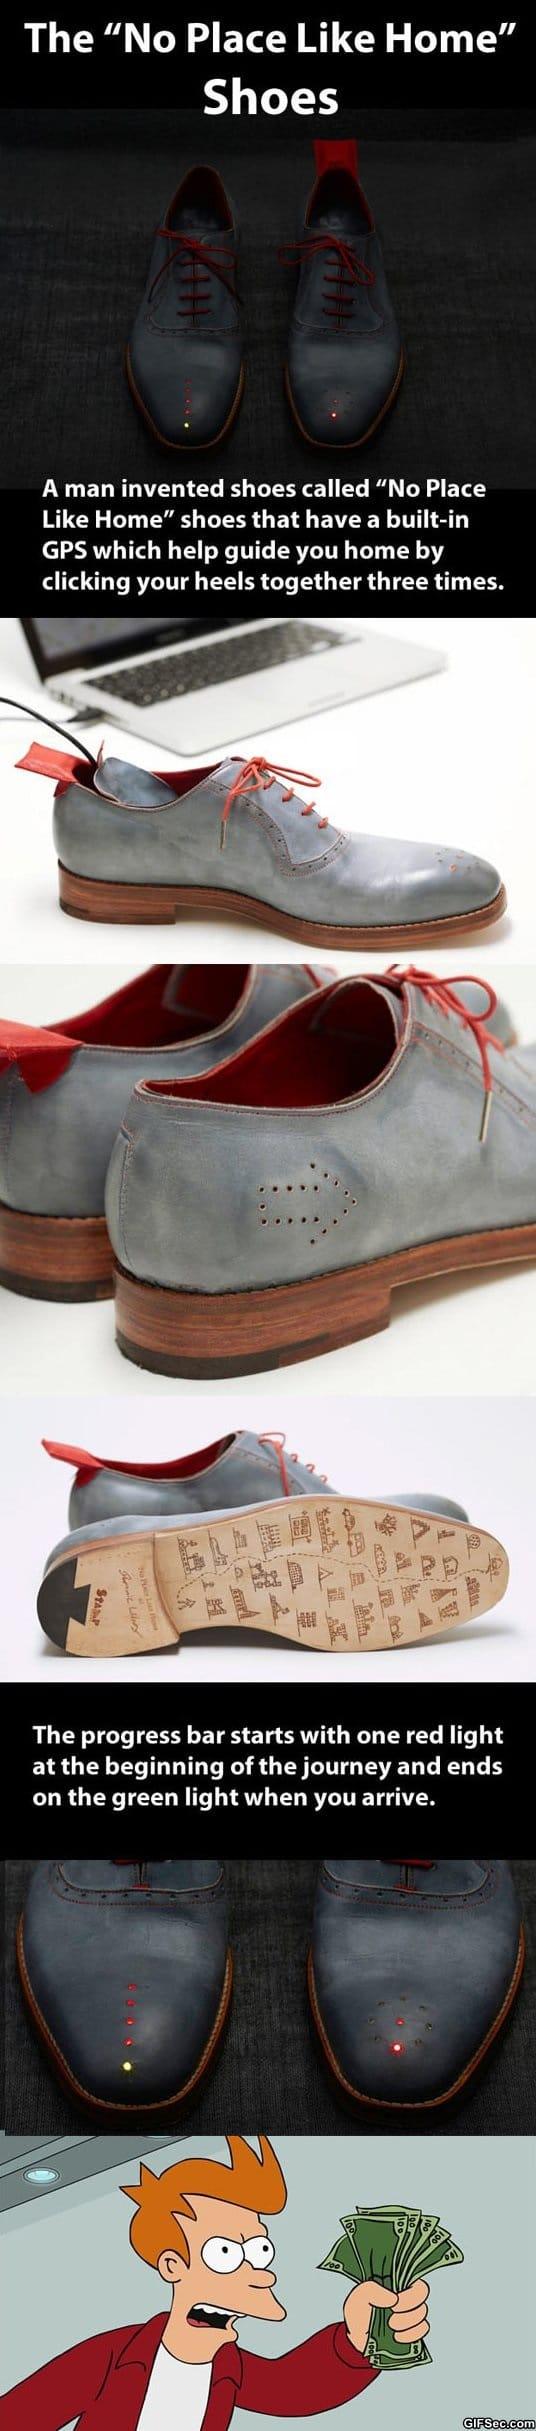 the-no-place-like-home-shoes